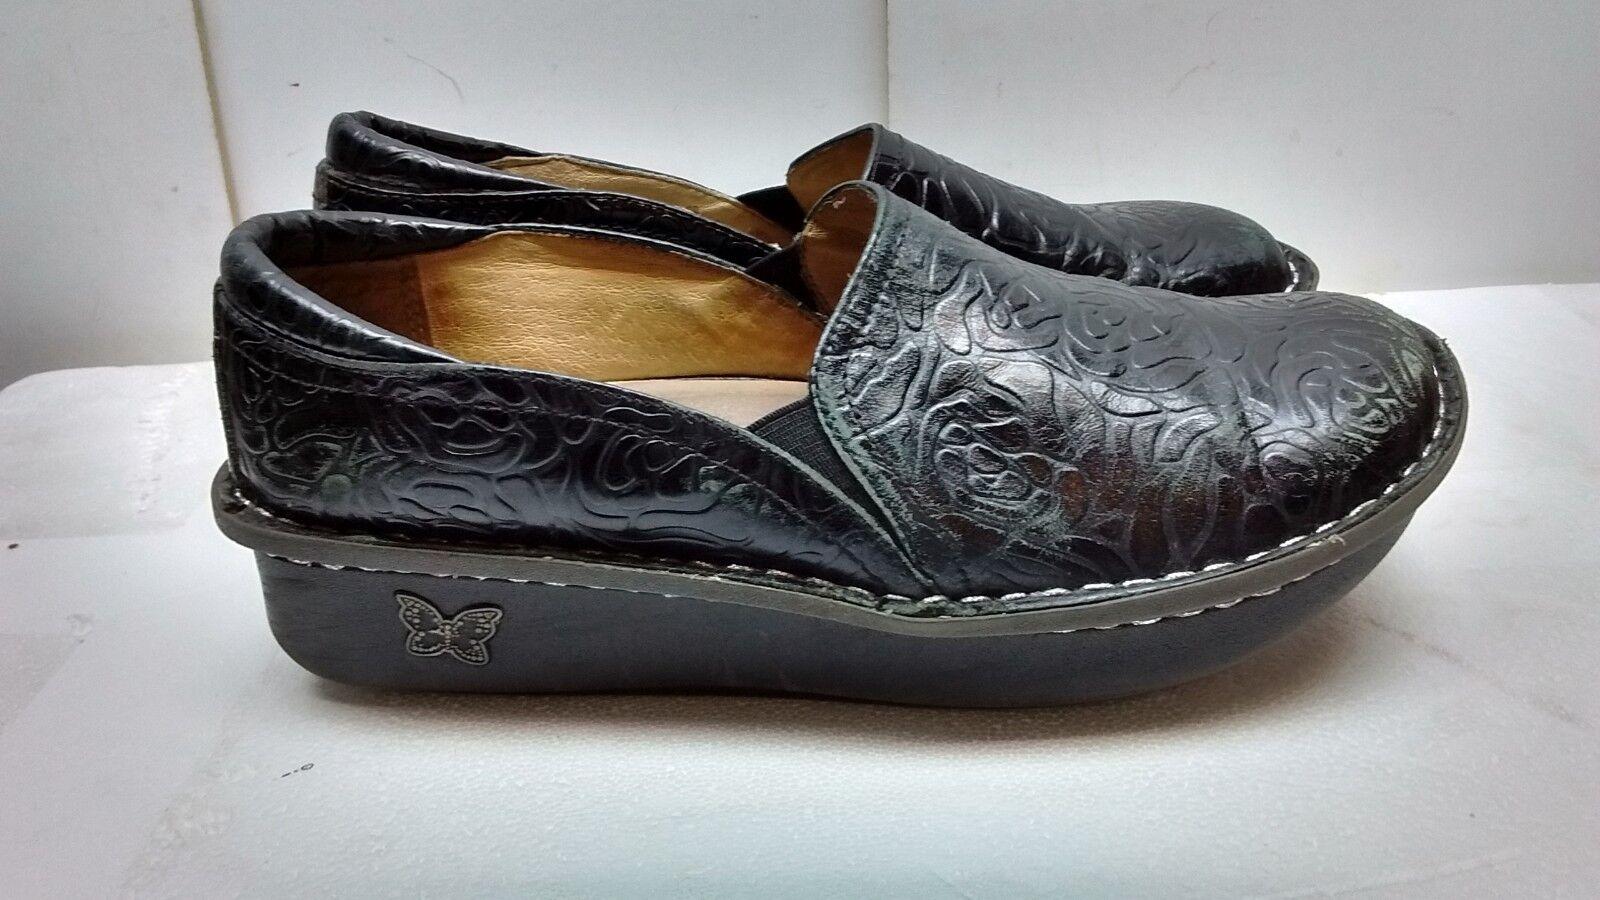 Alegria PG LITE en cuir noir à Enfiler Mocassin Sabots travail femmes Chaussure Taille 9-9.5M 39